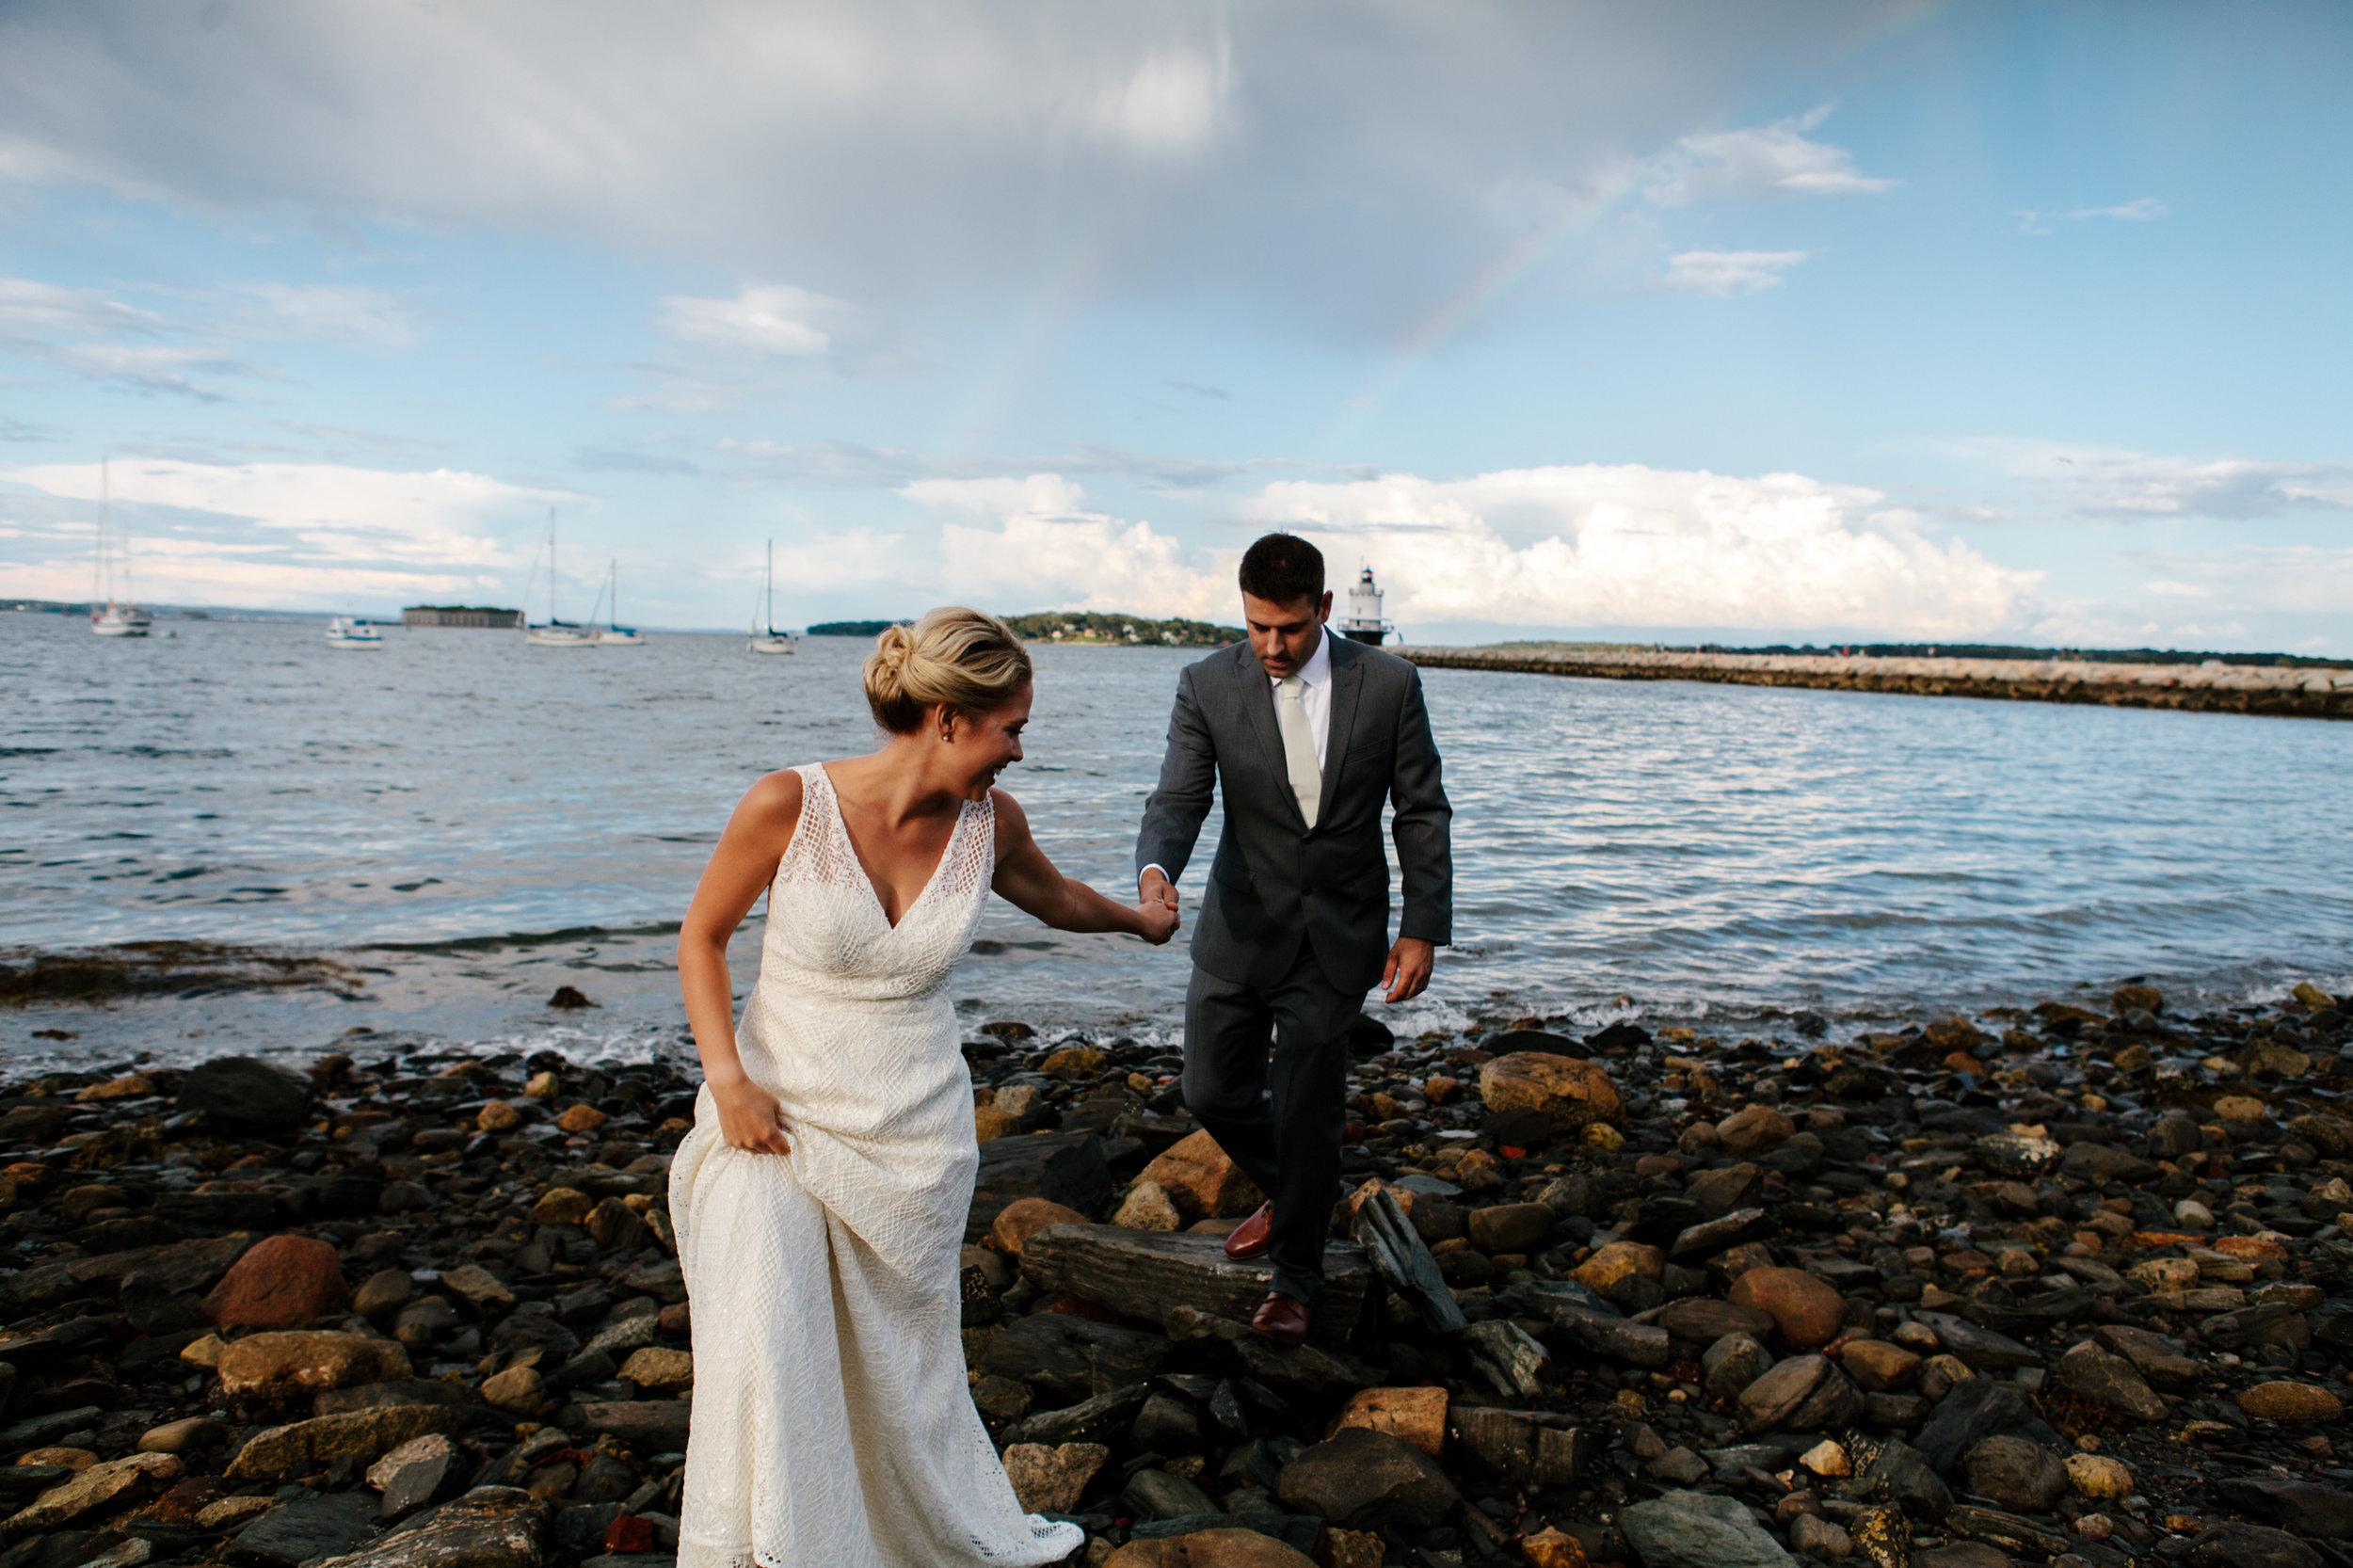 spring-point-ledge-lighthouse-wedding-south-portland-maine-2039.jpg